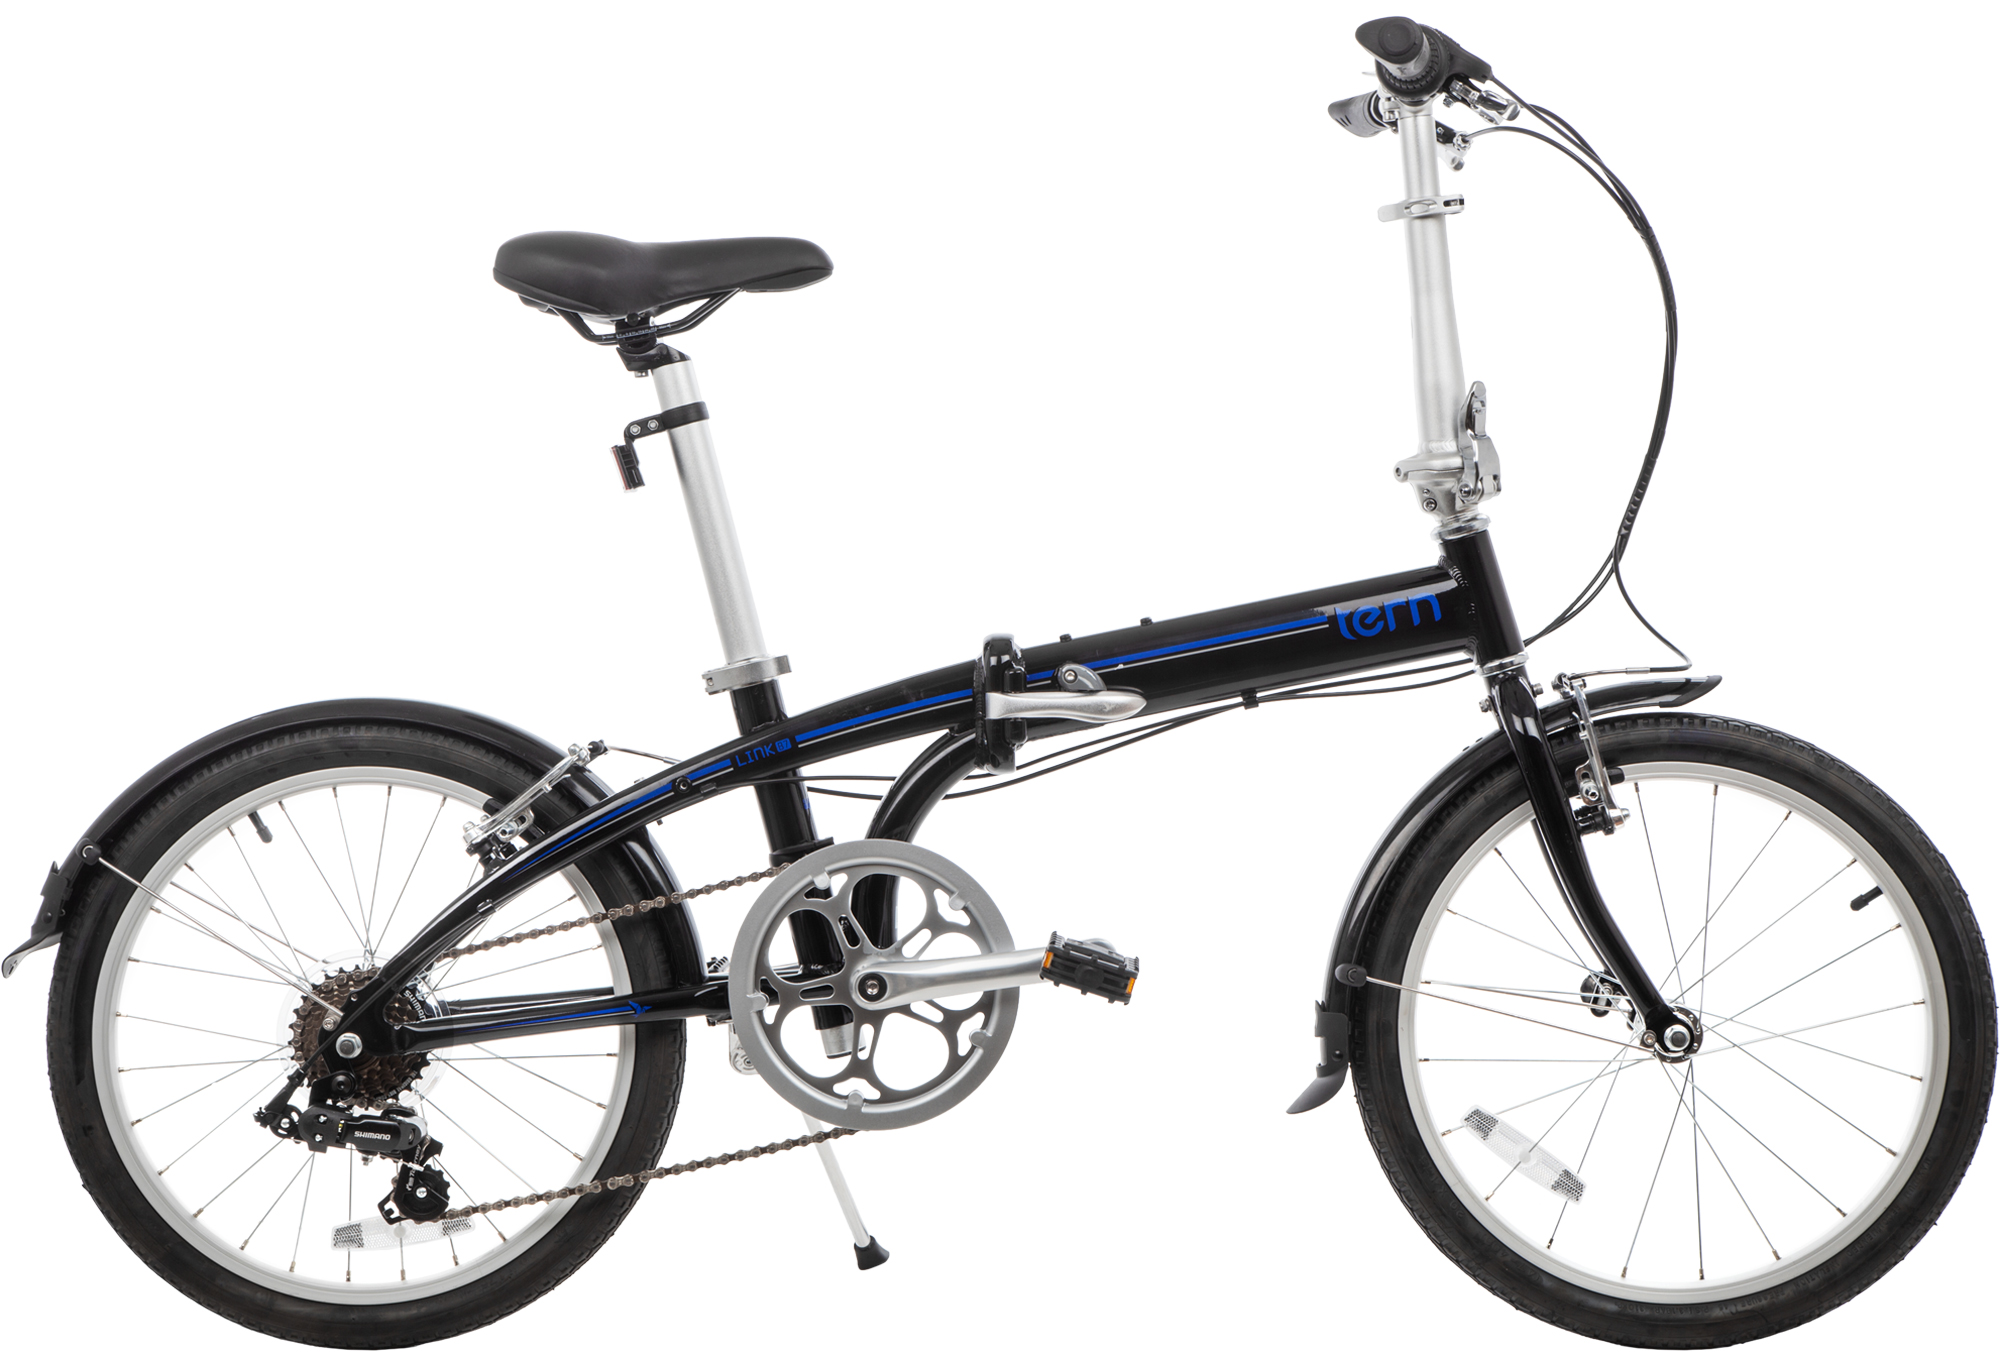 Tern Велосипед складной Tern Link B7  велосипед tern link uno 2014